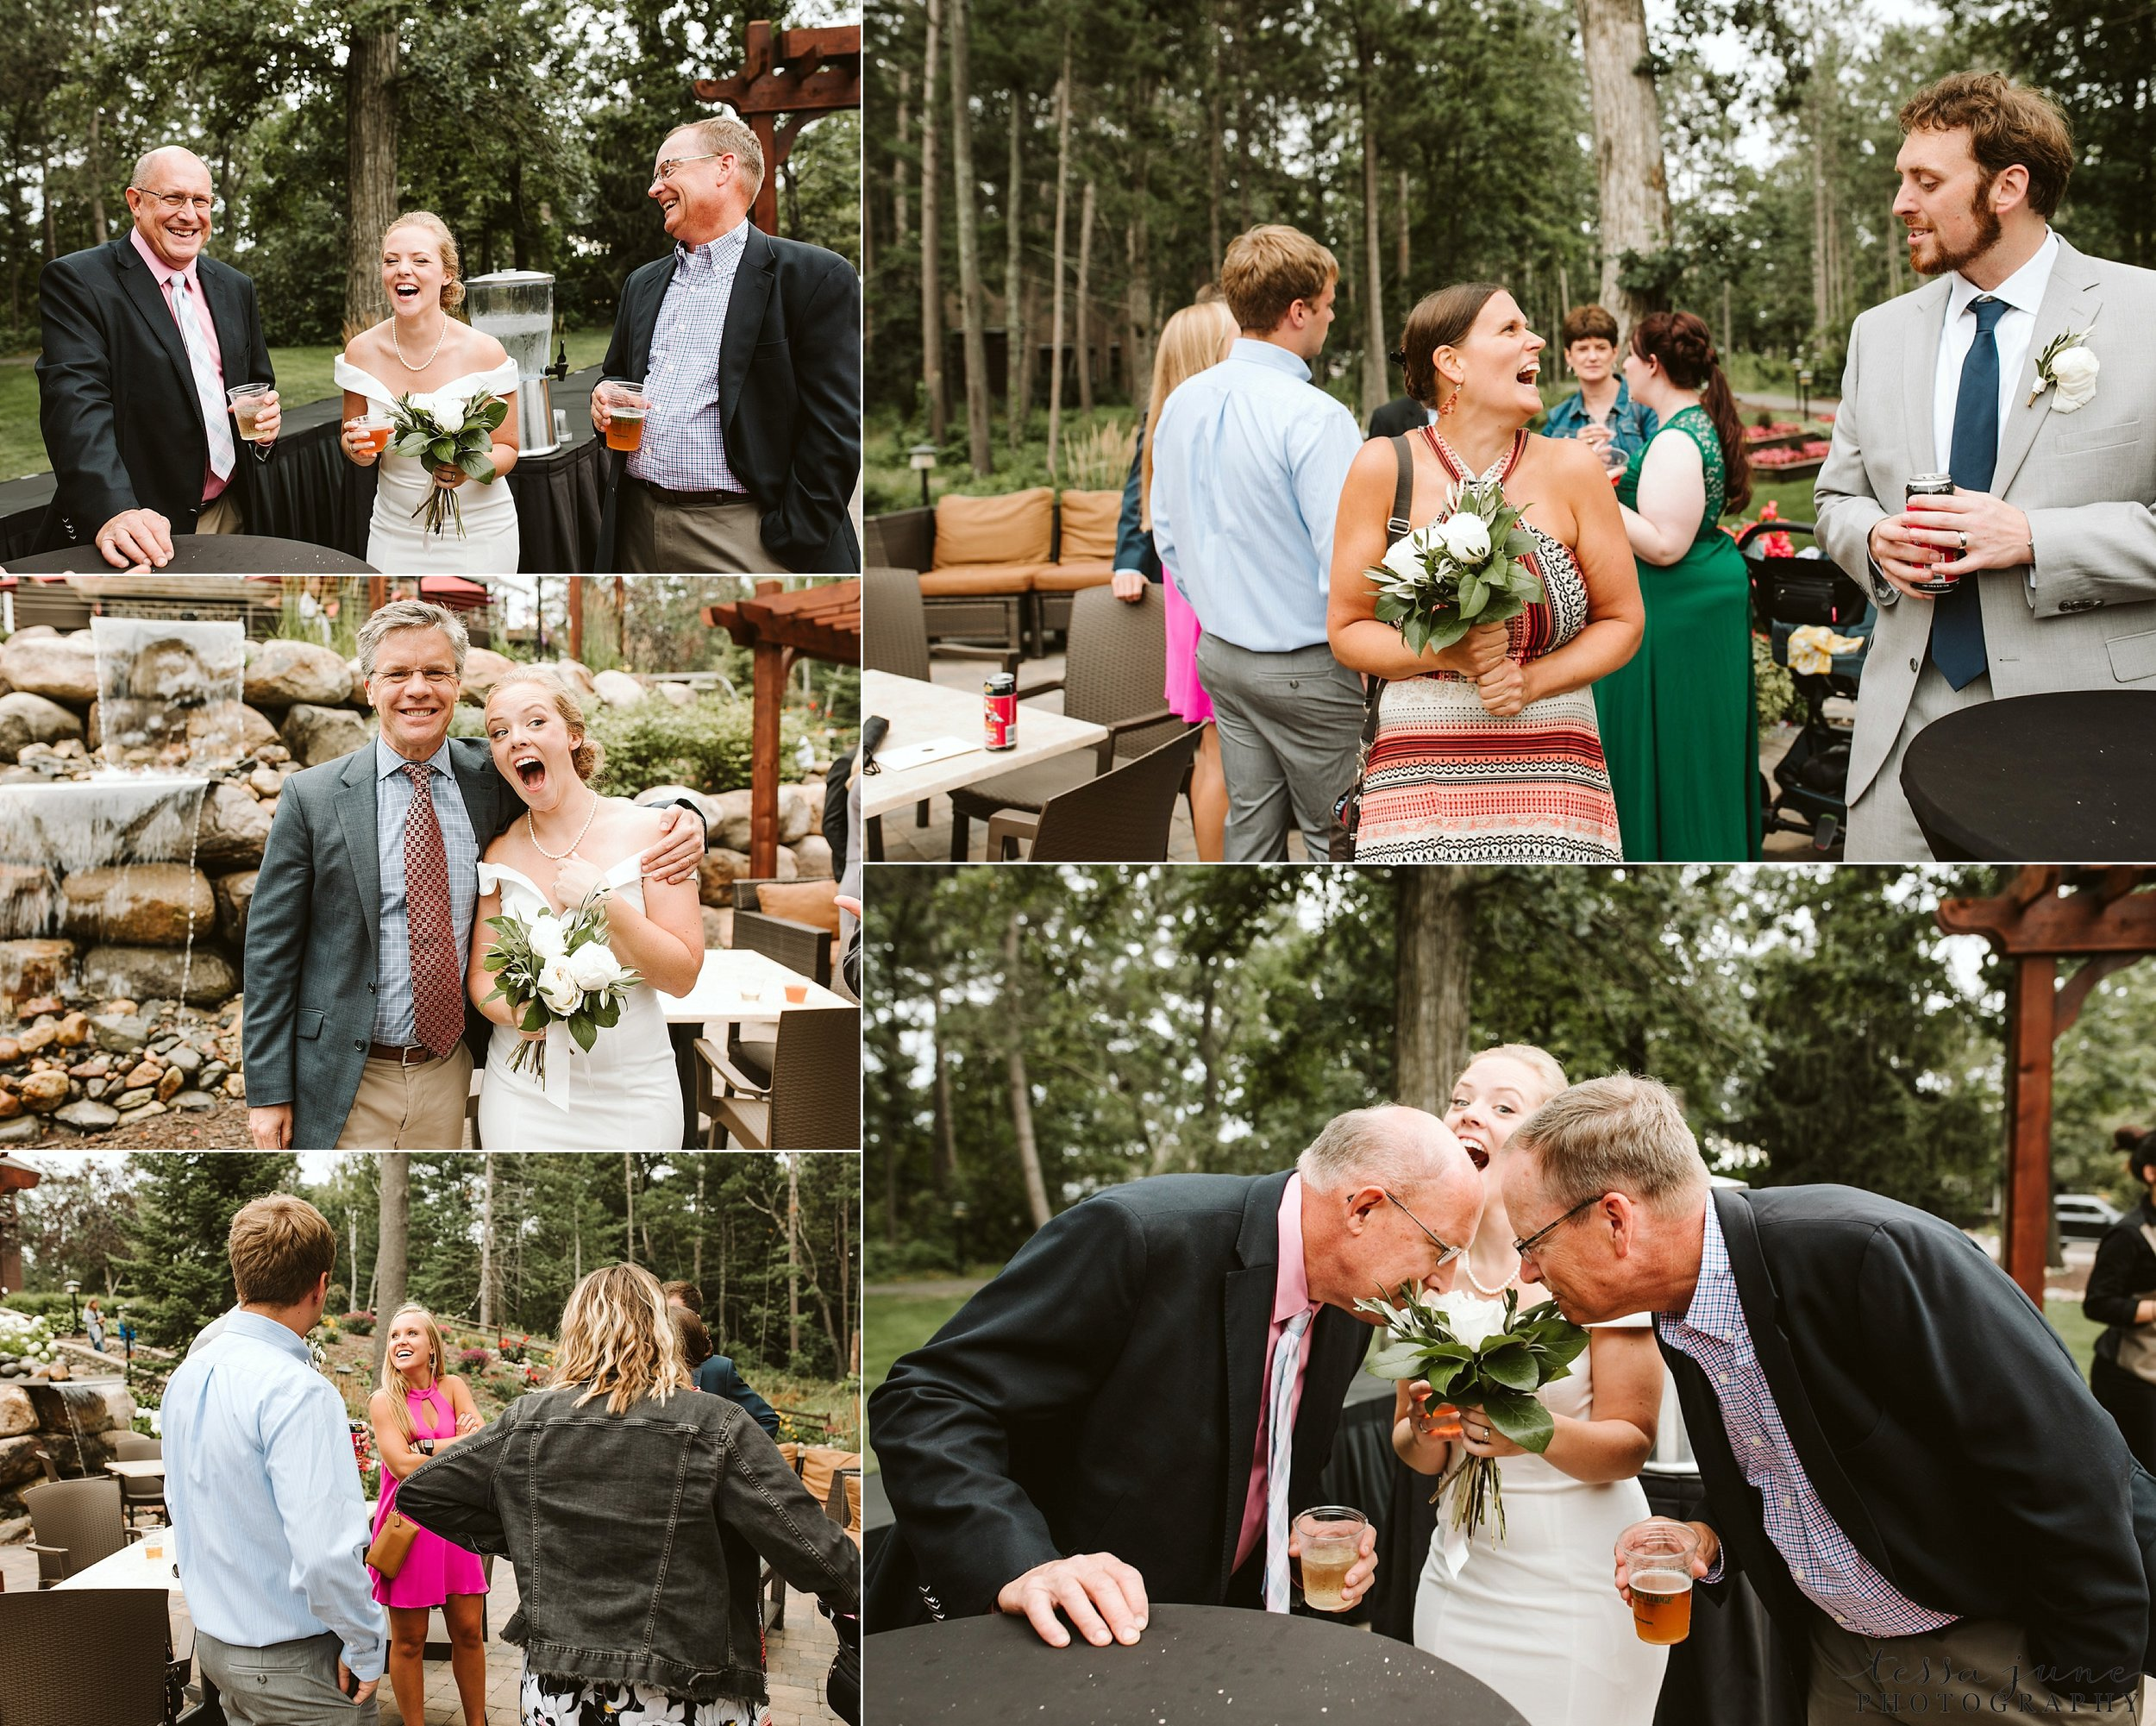 grandview-lodge-wedding-nisswa-minnesota-reception-cocktail-hour